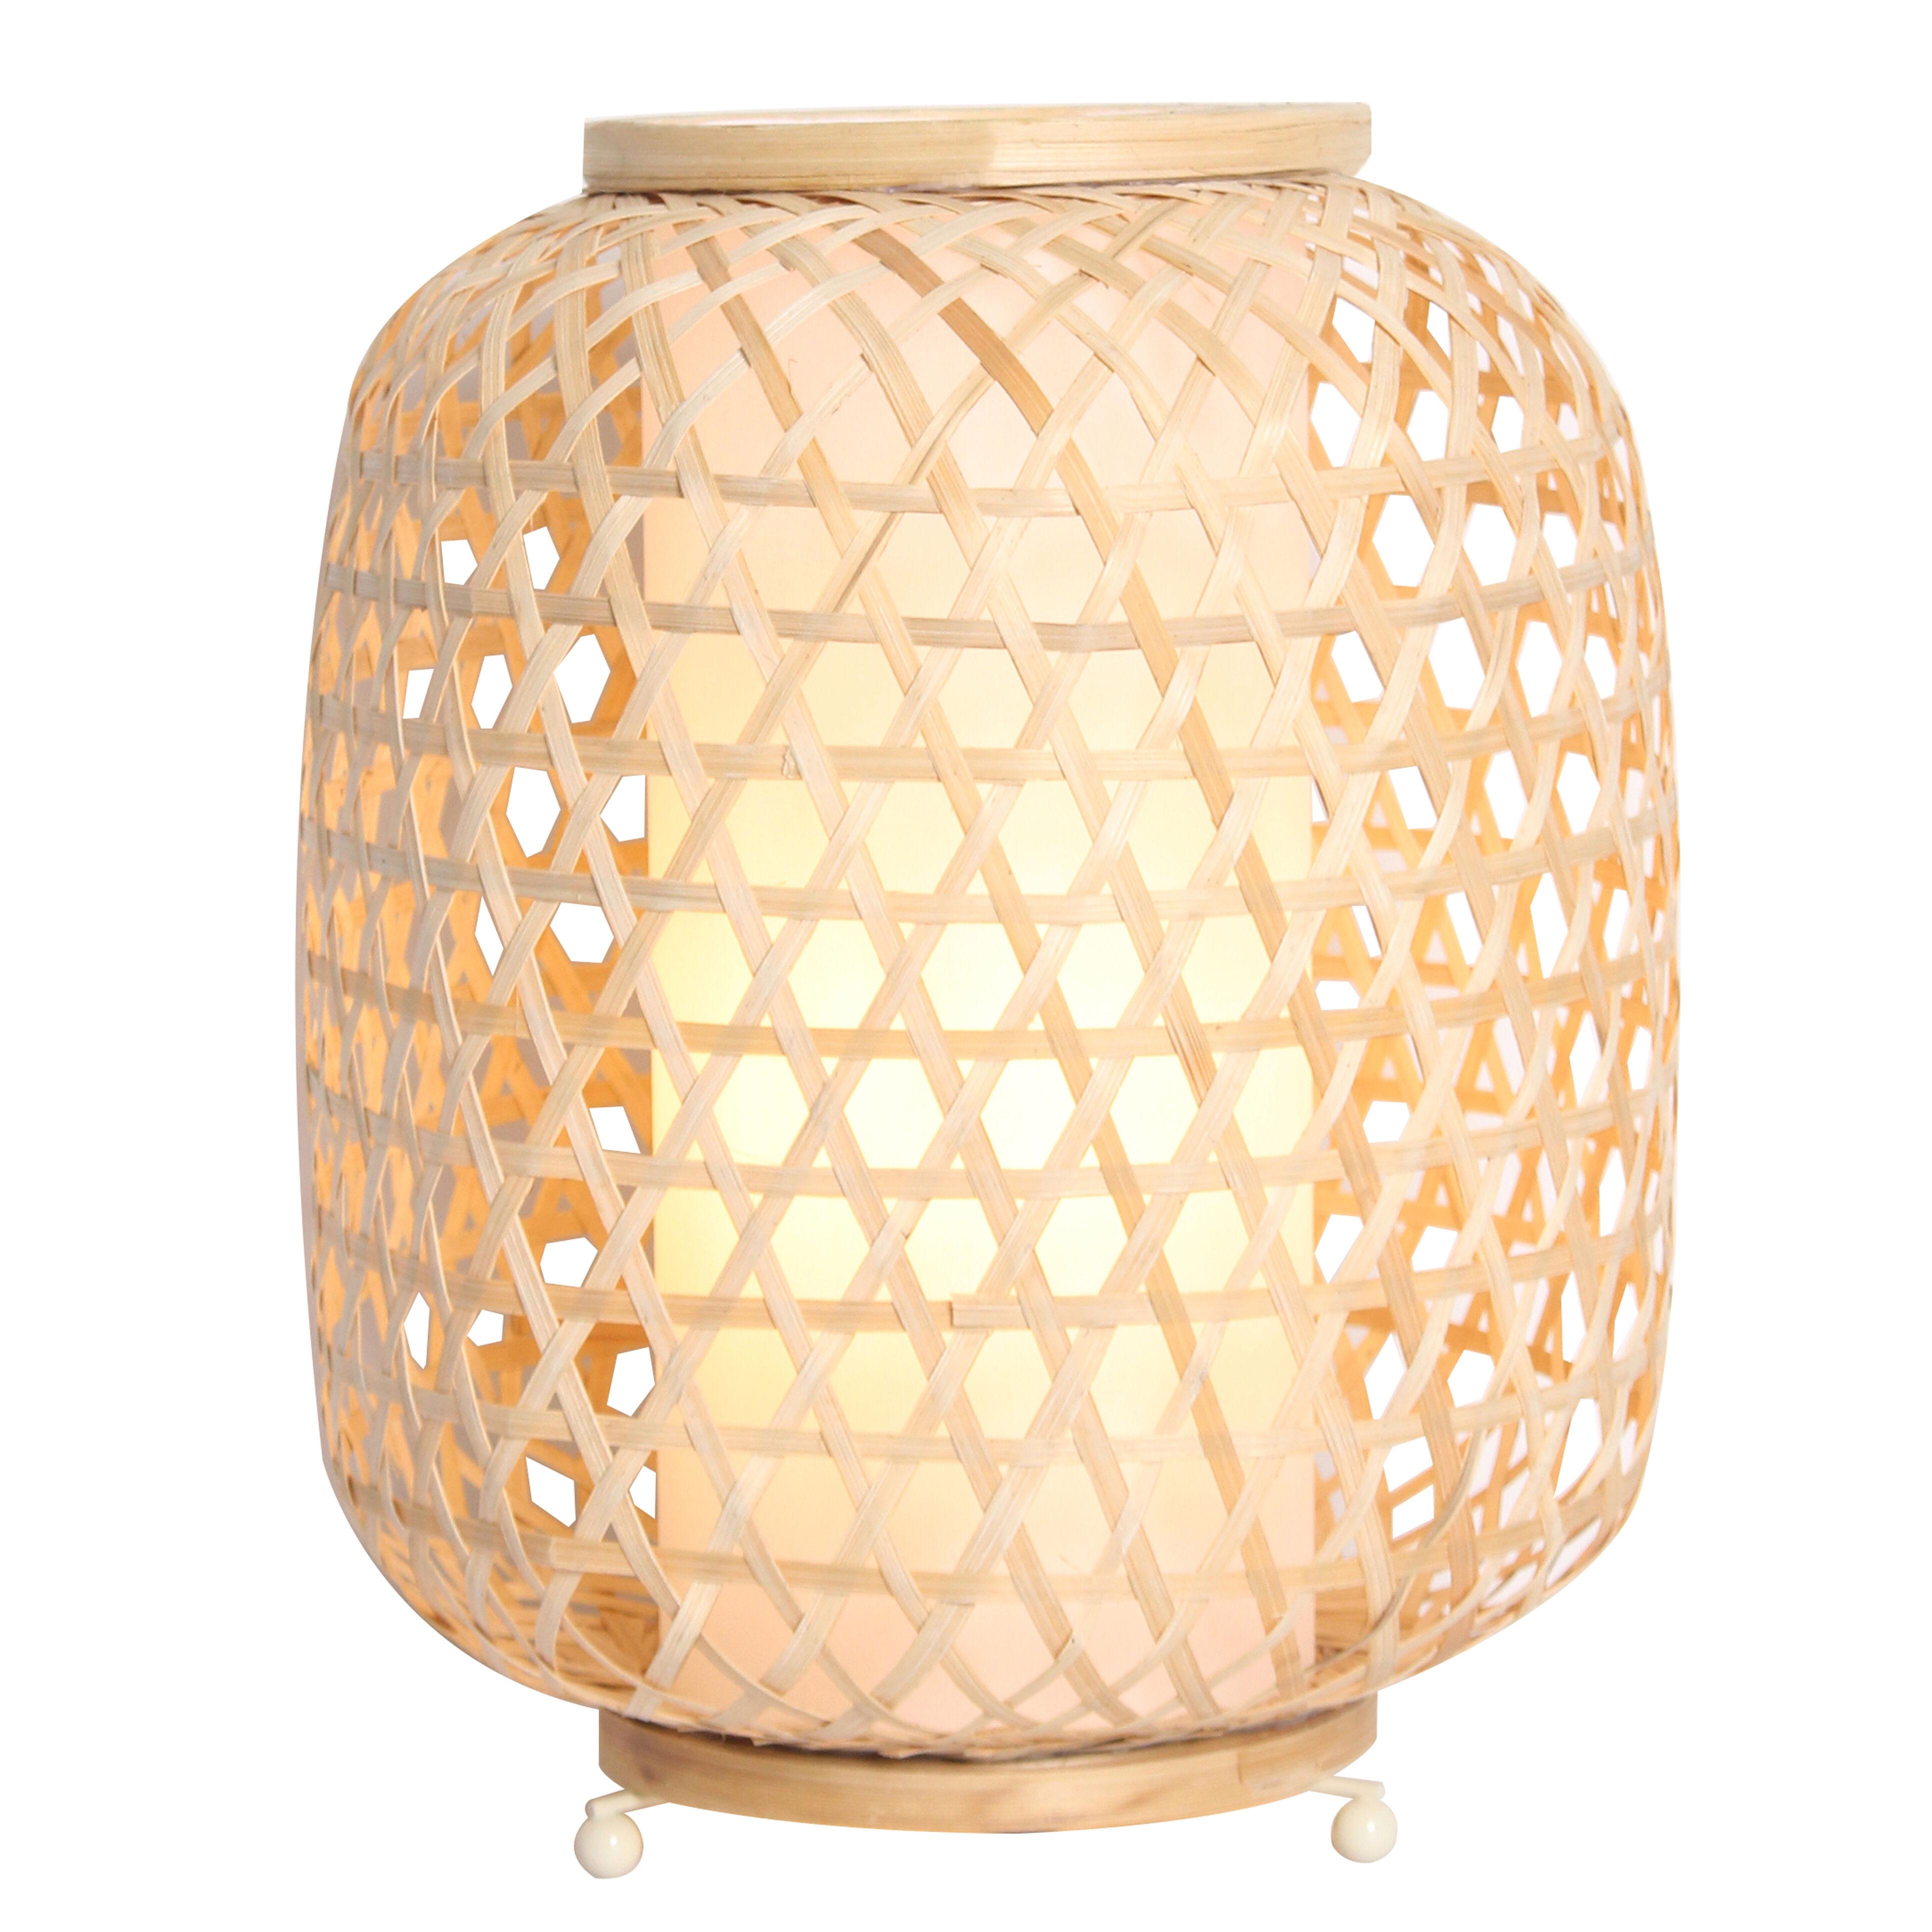 Keria Lampe en bambou bois